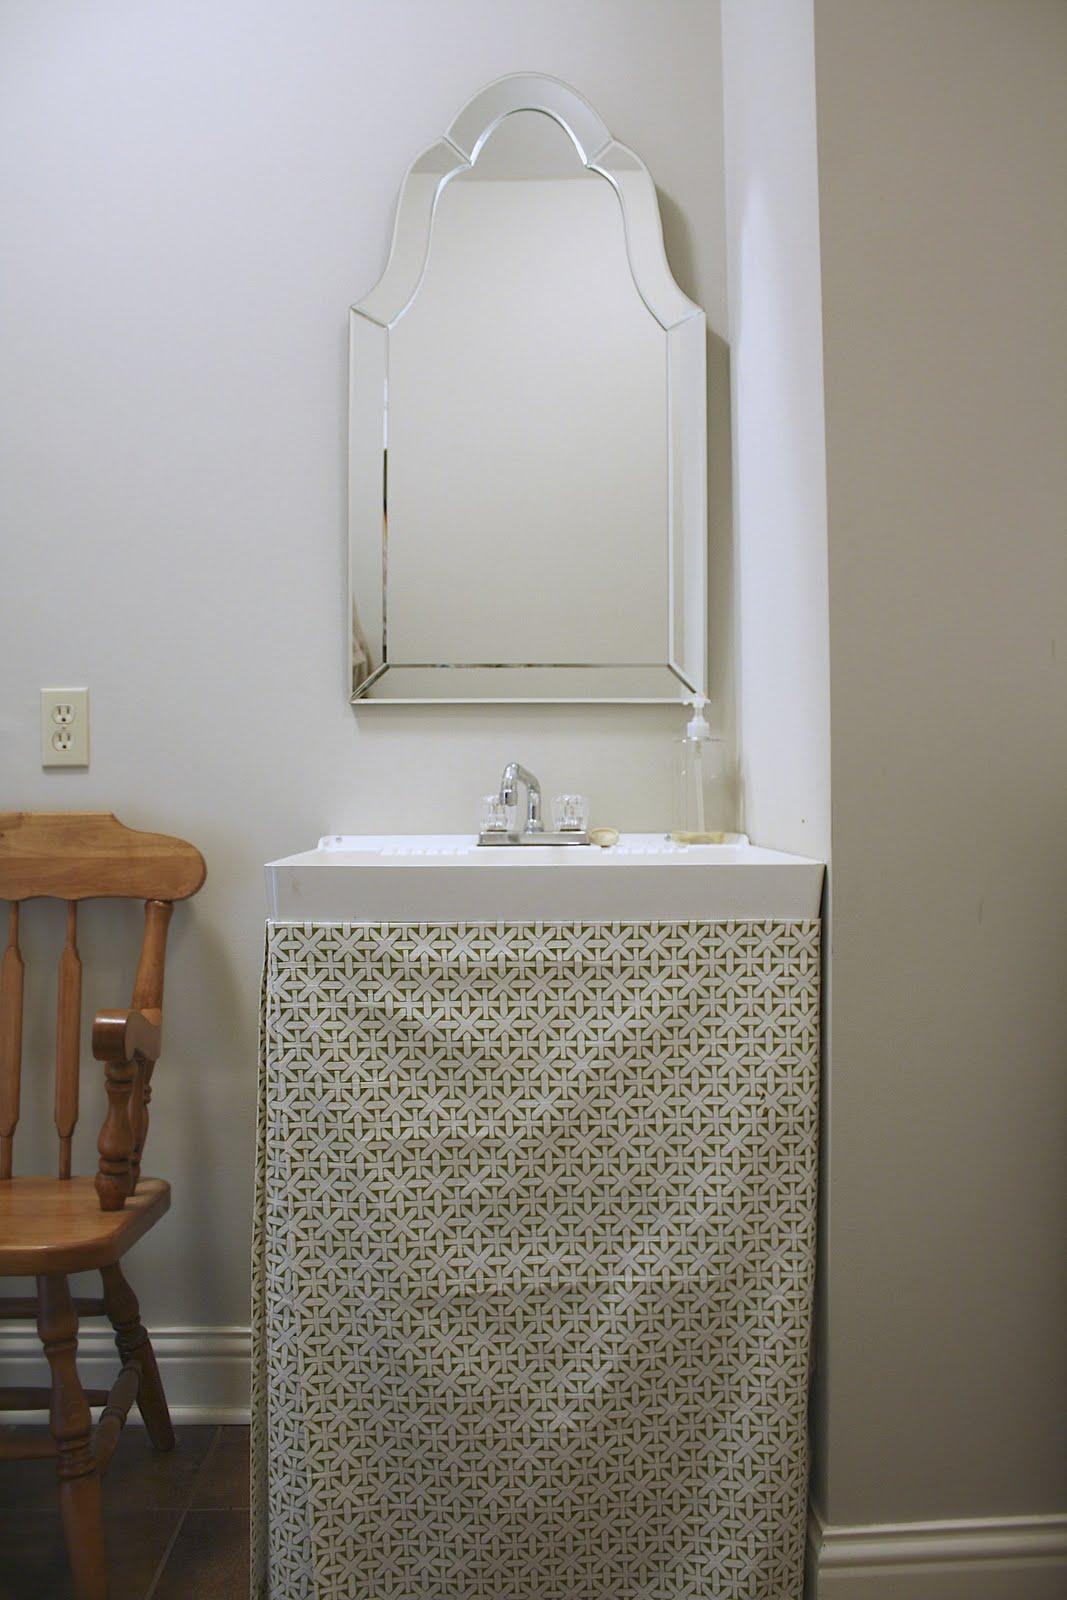 DIY Utility Sink Skirt - Home Design Interior Paris